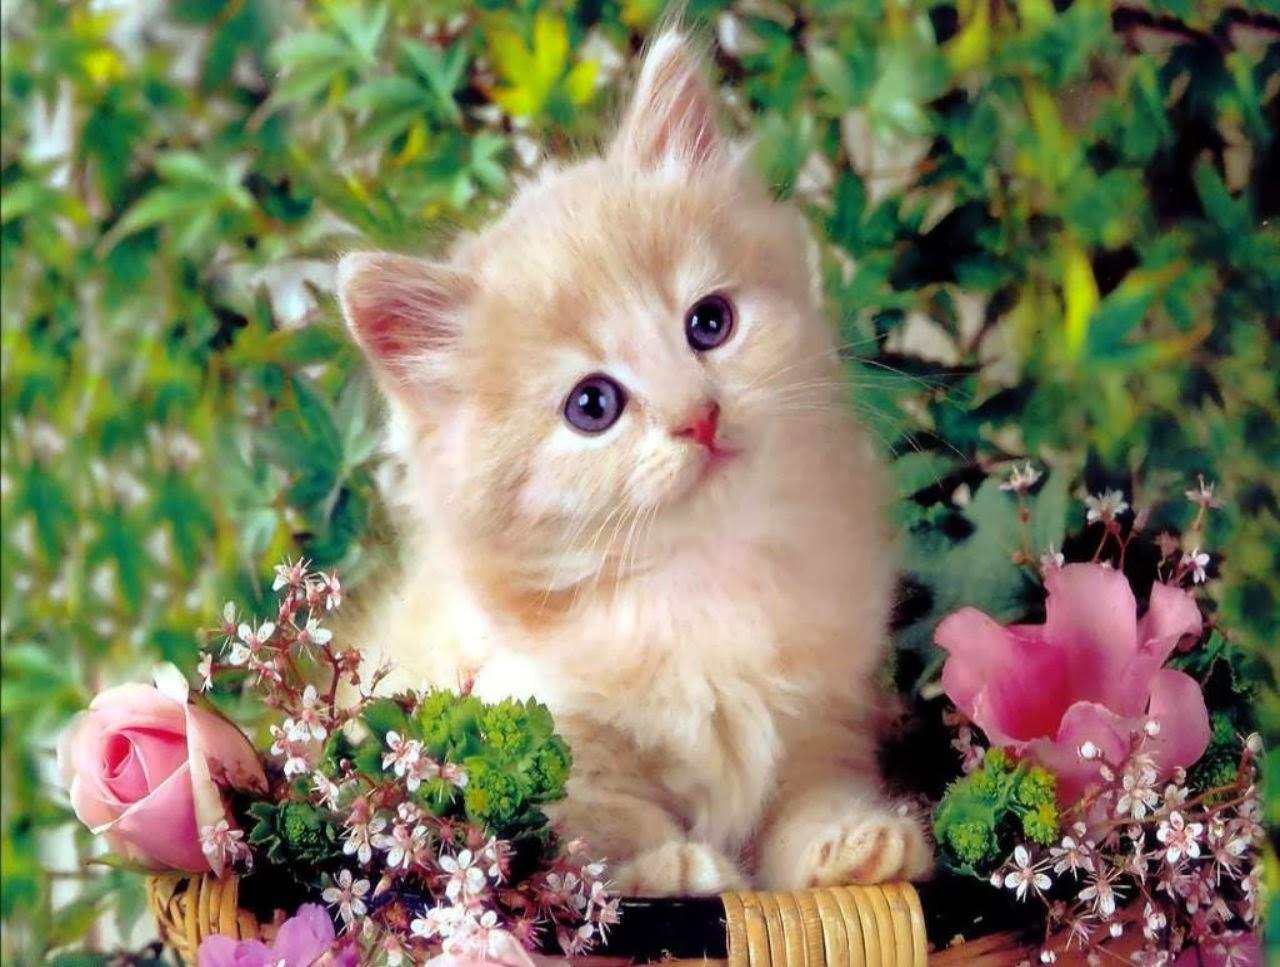 Cute kitten wallpaper for desktop wallpaperyork brows your cute kitten wallpaper for desktop thecheapjerseys Choice Image